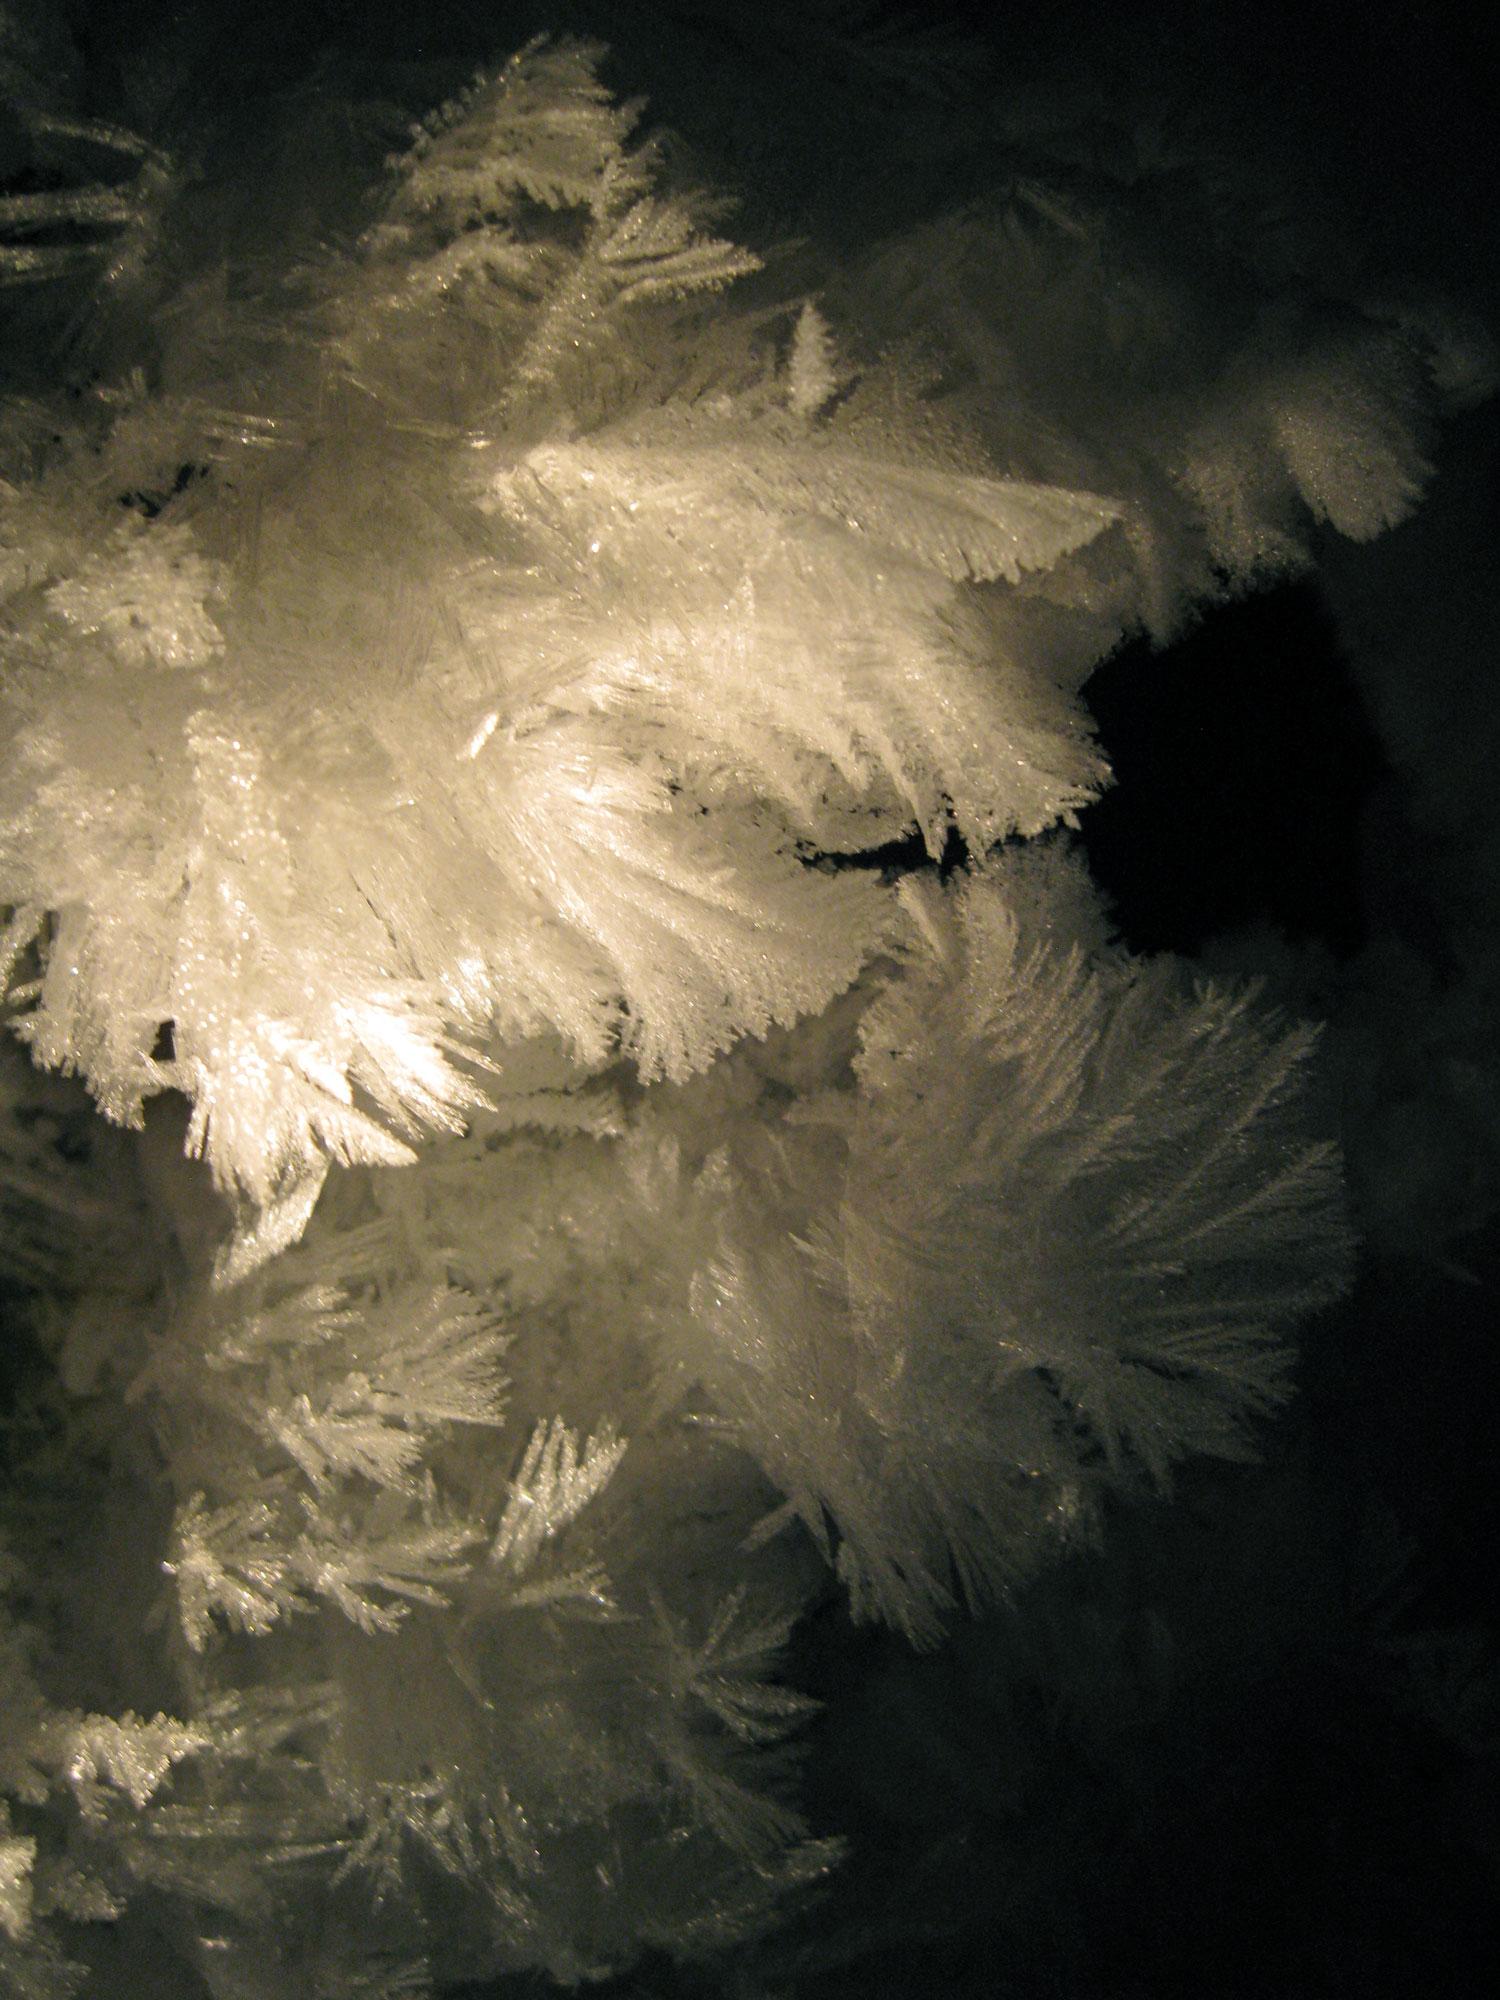 Graceful frost sculptures